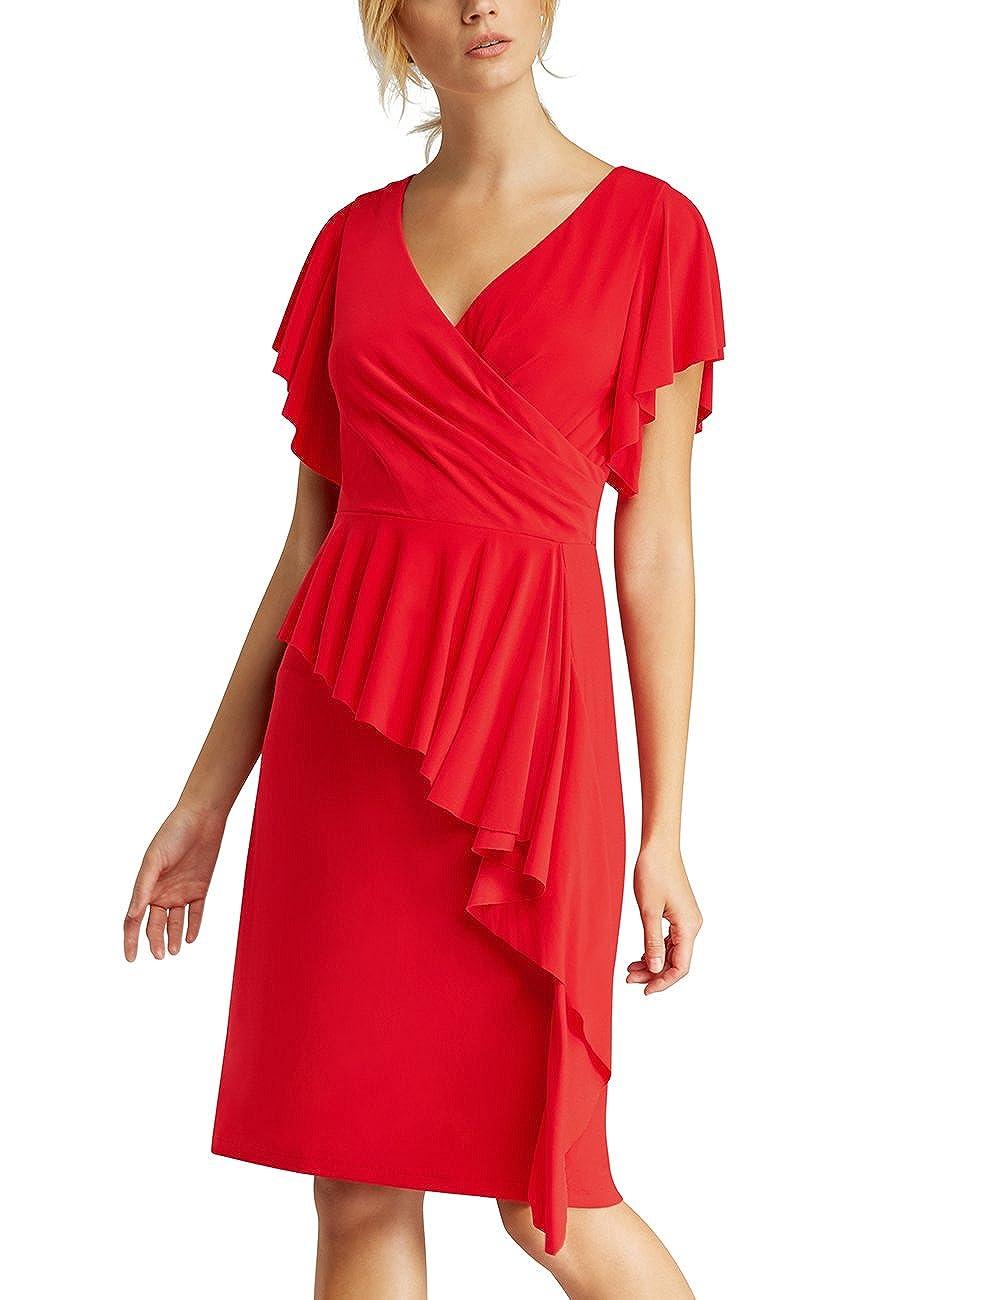 Womens Glamour: Black-Lipstickred-Flowers-Fake Leather Dress Apart Fashion DM3NY